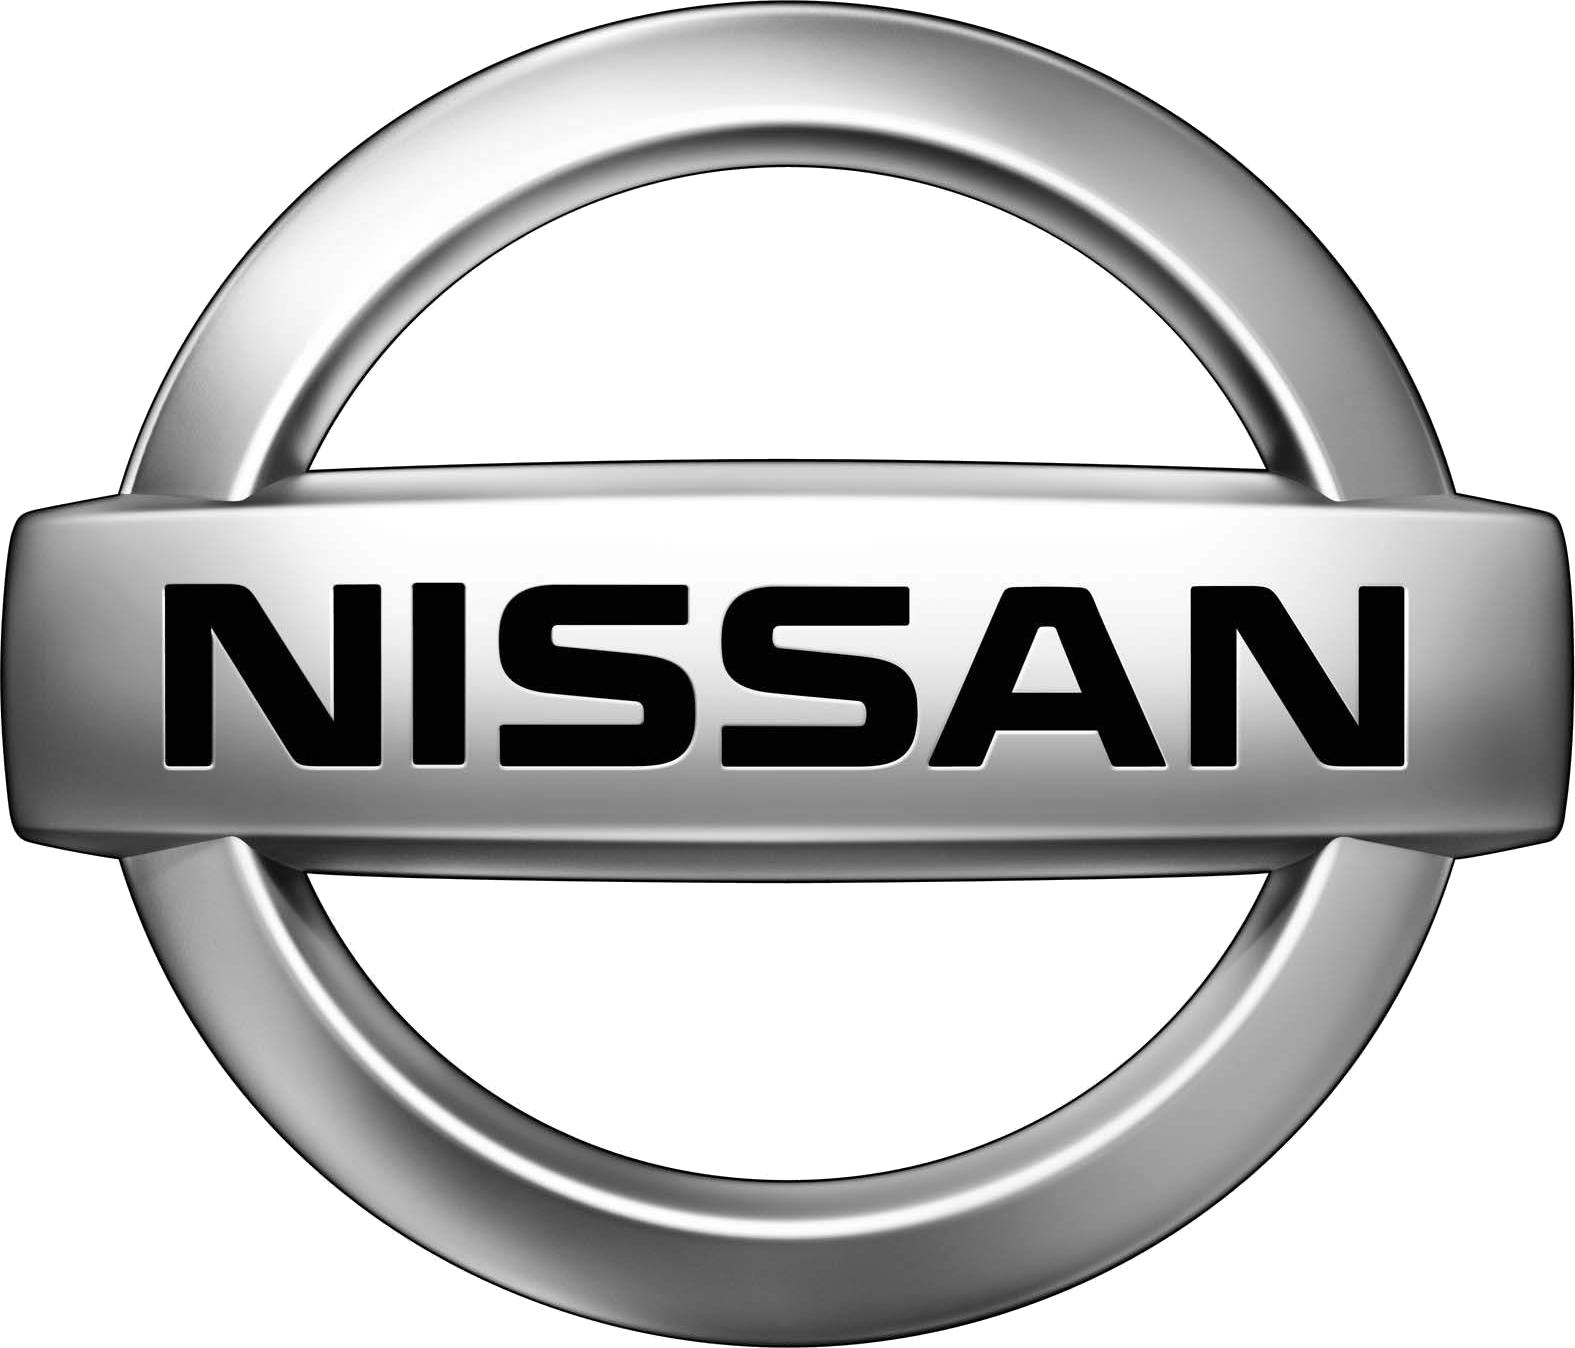 Kime ait yeni sahibi kimdir  Nissan